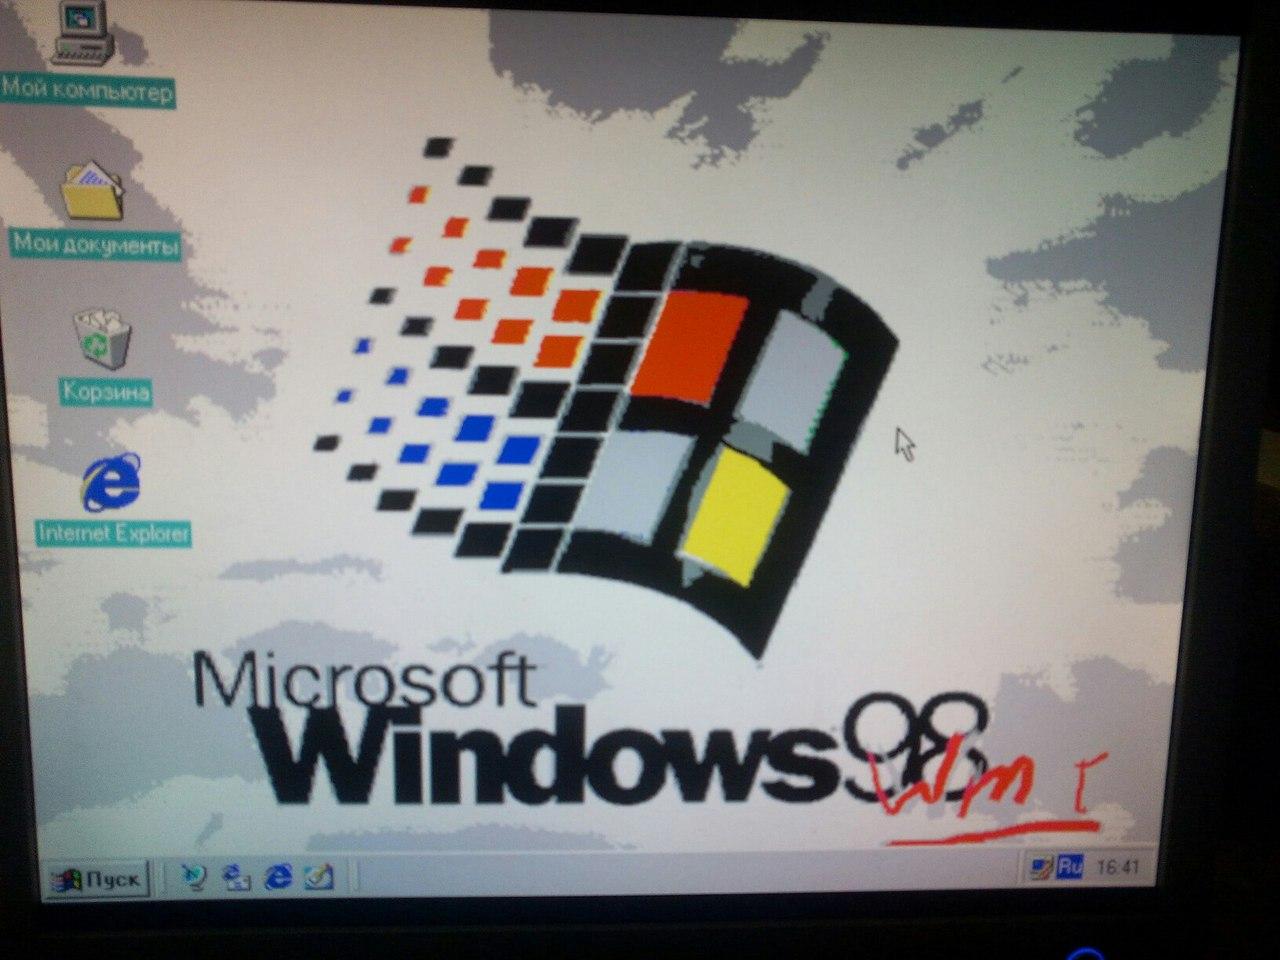 Запускаем и эмулируем Windows на Raspberry Pi с помощью QEMU